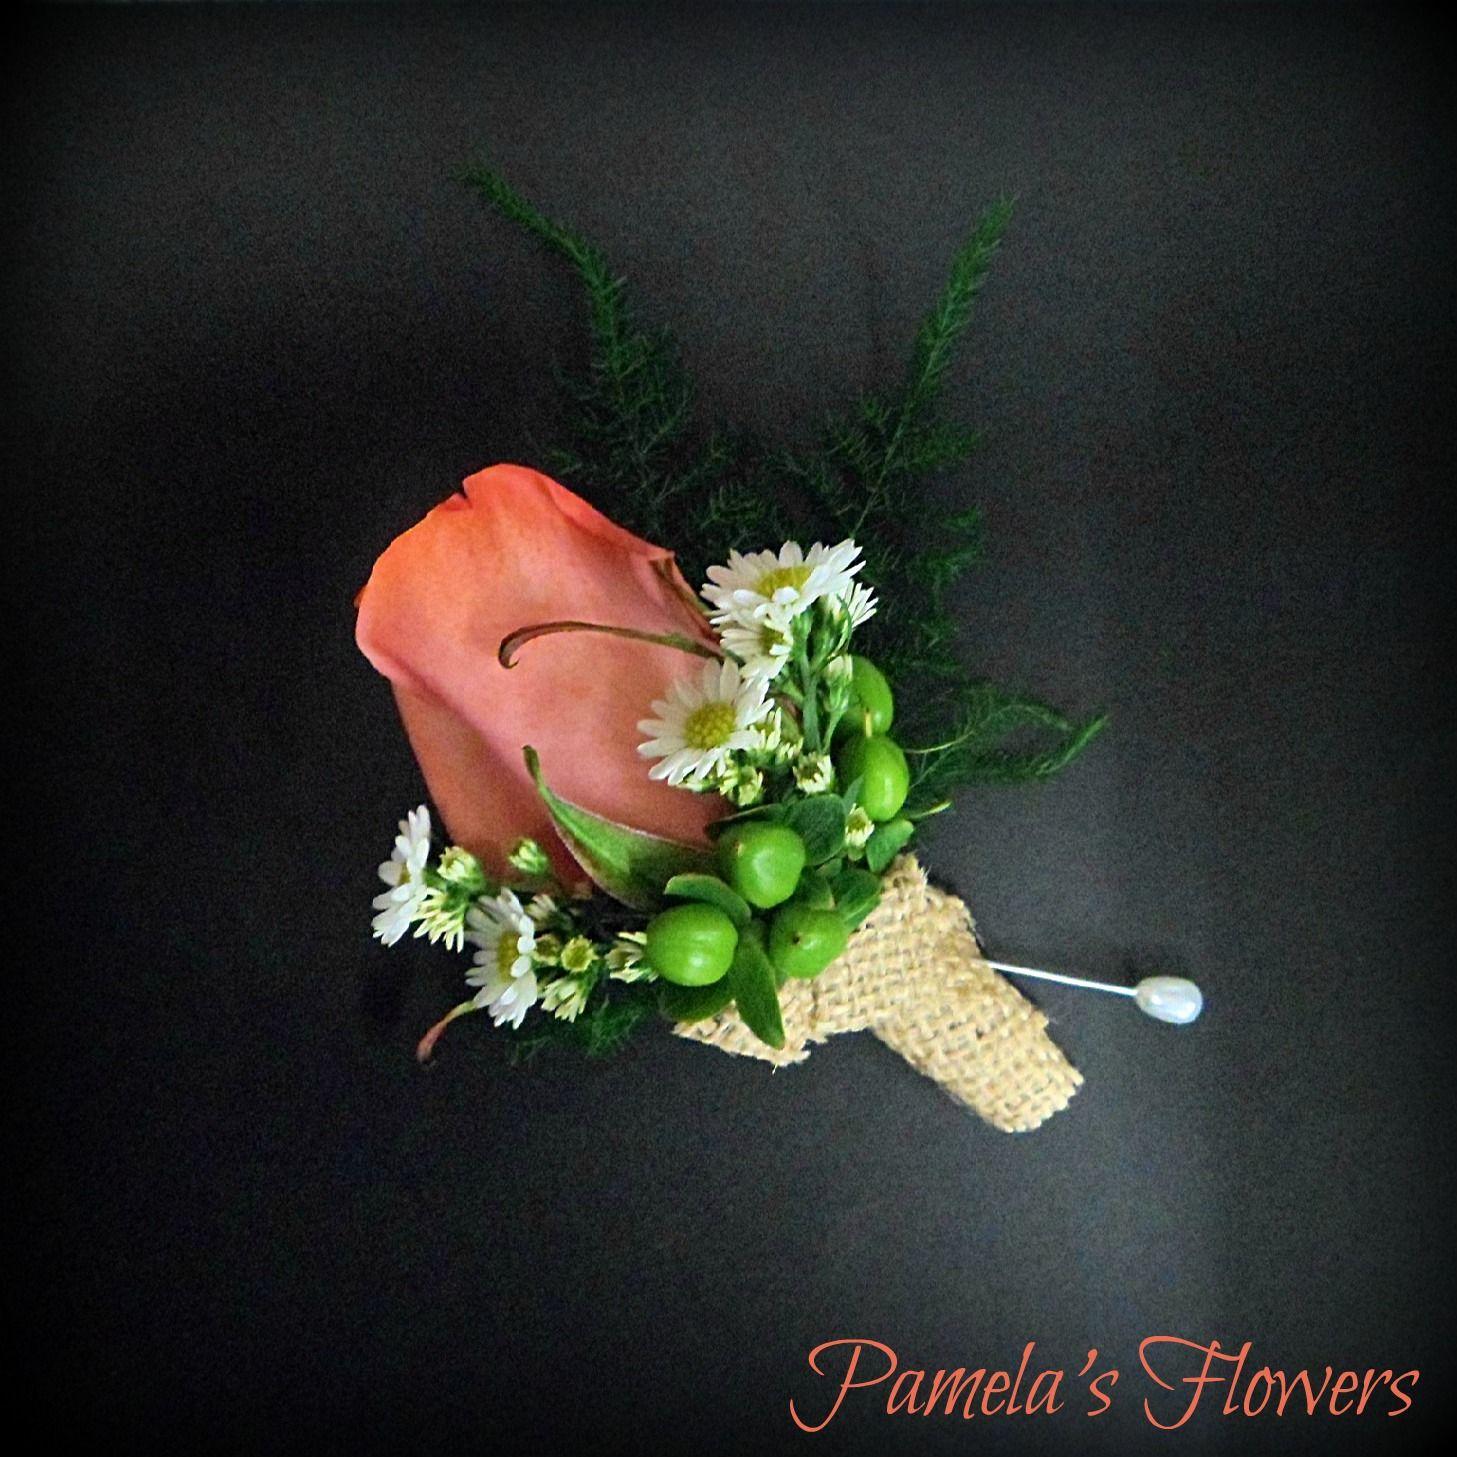 Weddings Enola Pa Harrisburg Area Trusted Local Florist Flower Arrangements Pretty Flowers Hand Tied Bouquet